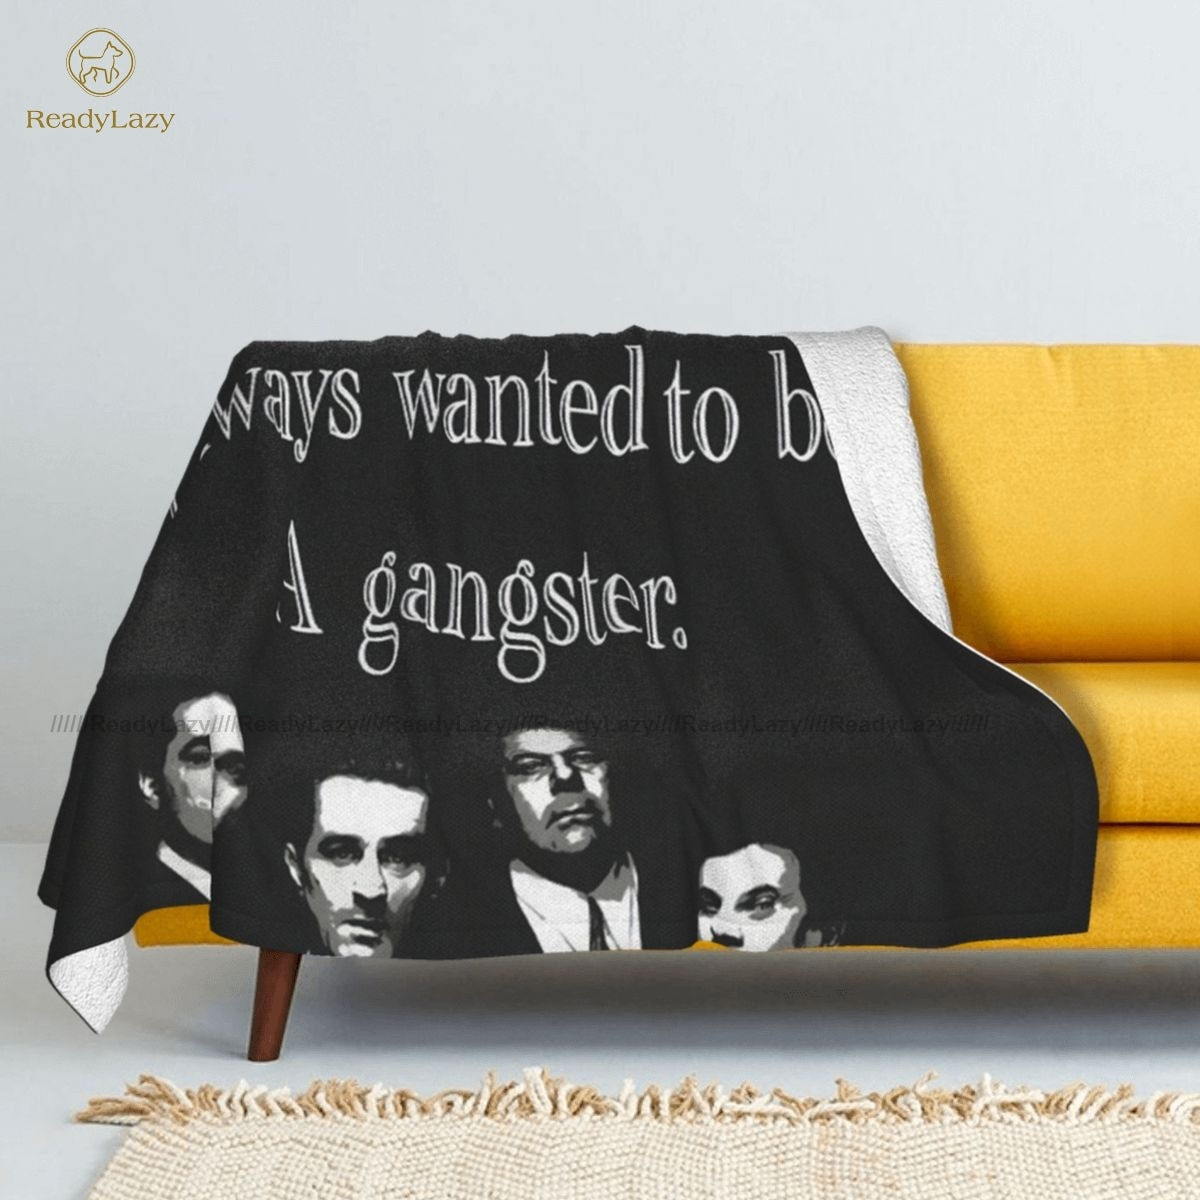 Gangsta-بطانية شيربا كبيرة من الصوف ، مفرش سرير ناعم عصري